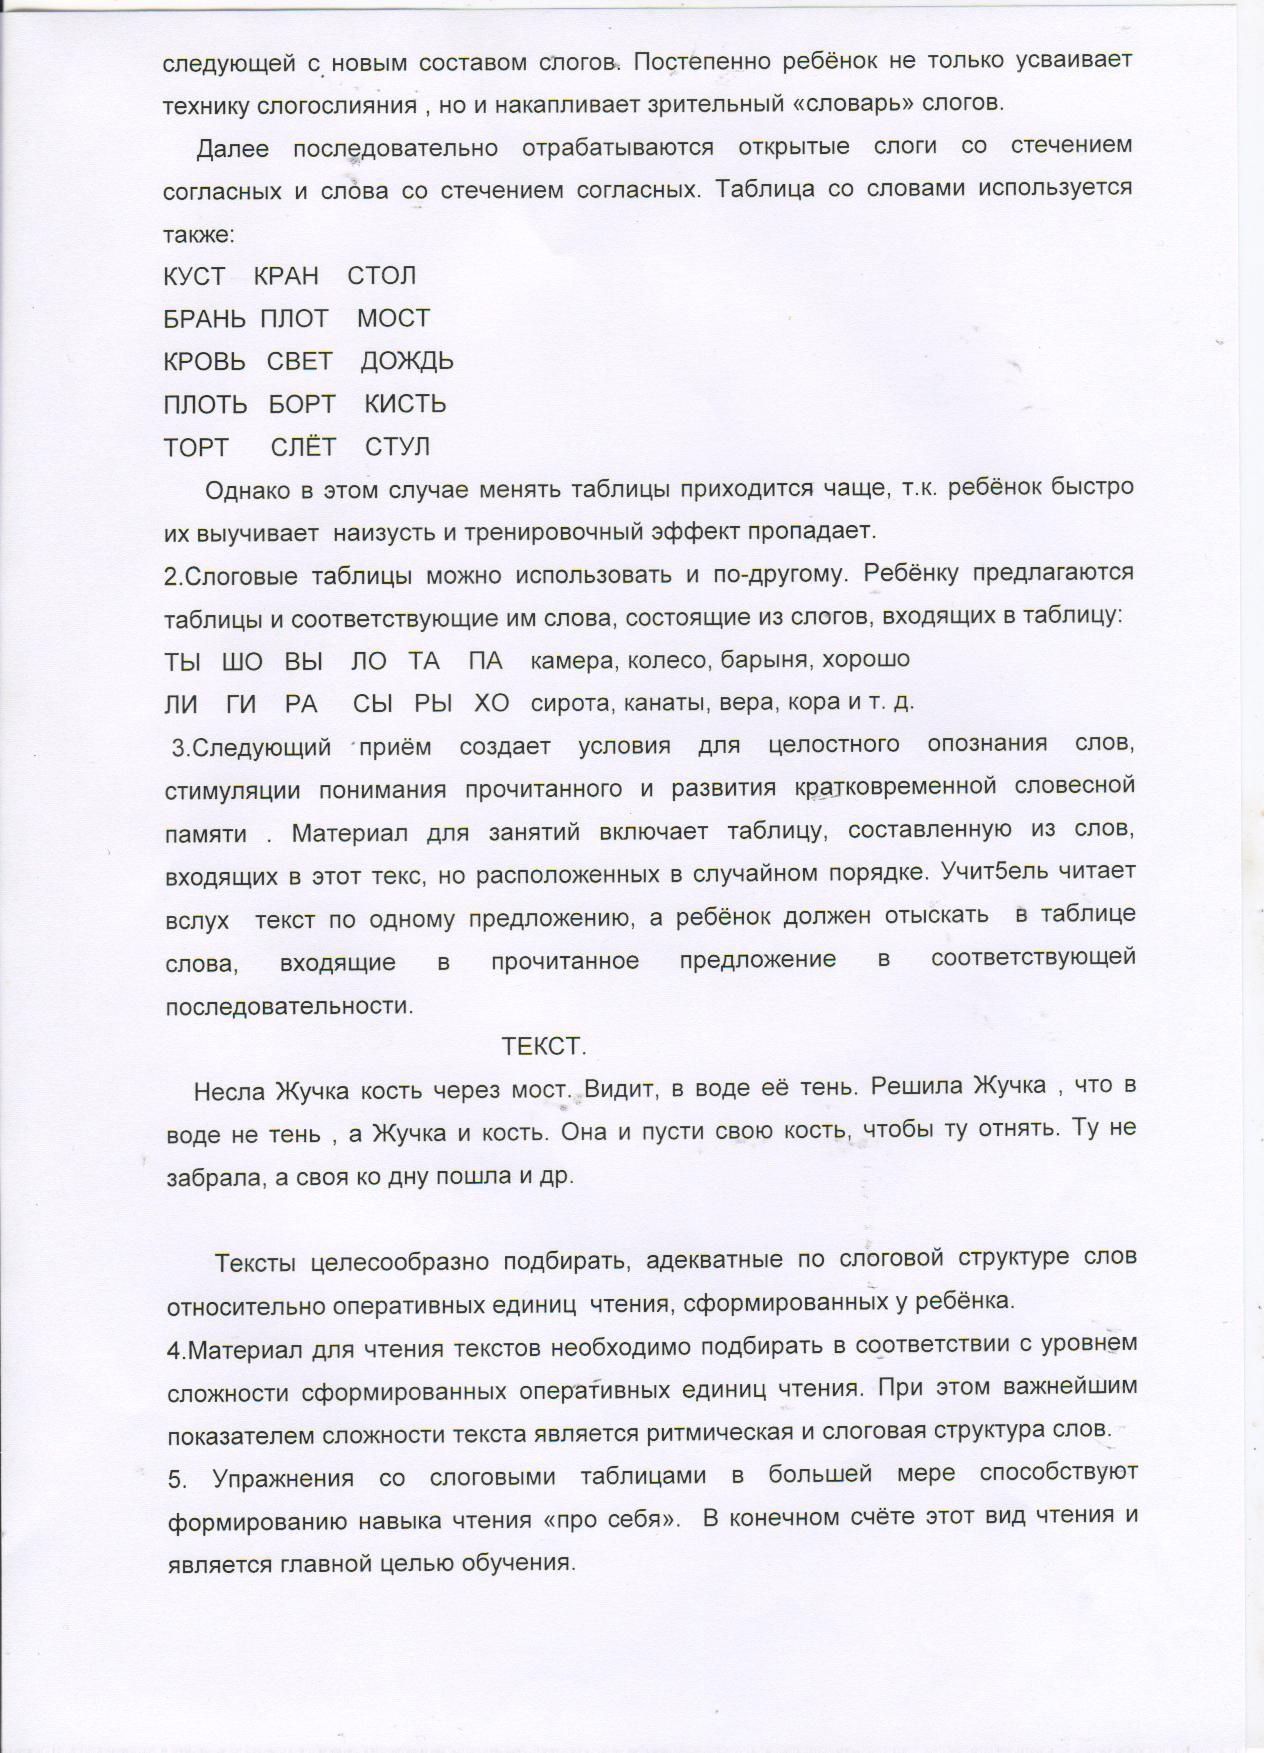 C:\Documents and Settings\Администратор\Рабочий стол\Тептякова Е.А. 009.jpg